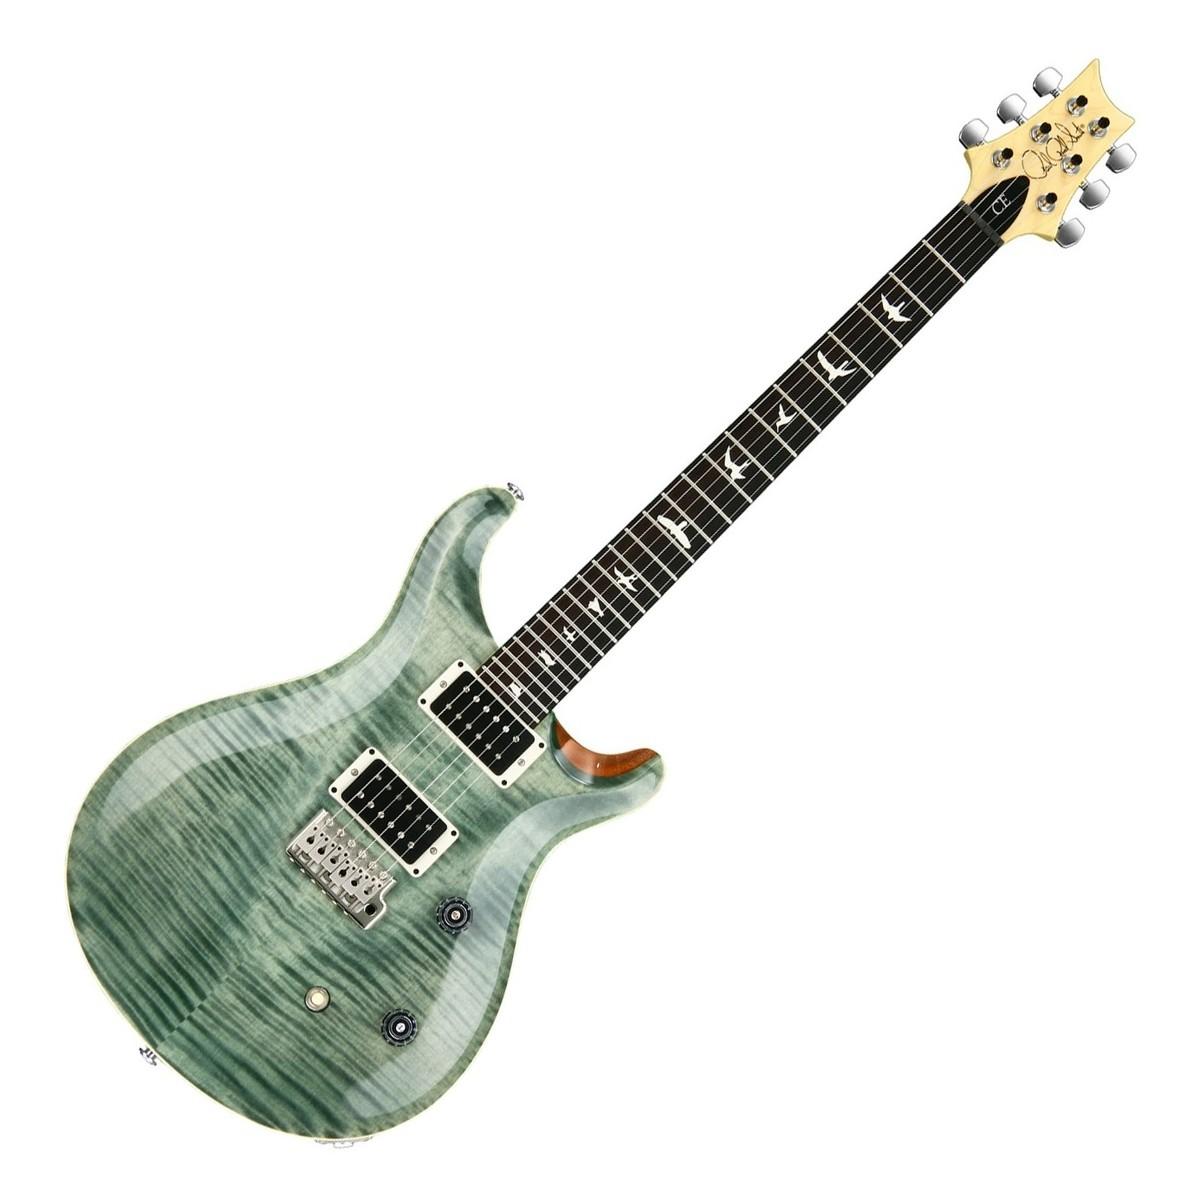 Cheap PRS CE24 Electric Guitar, Trampas Green